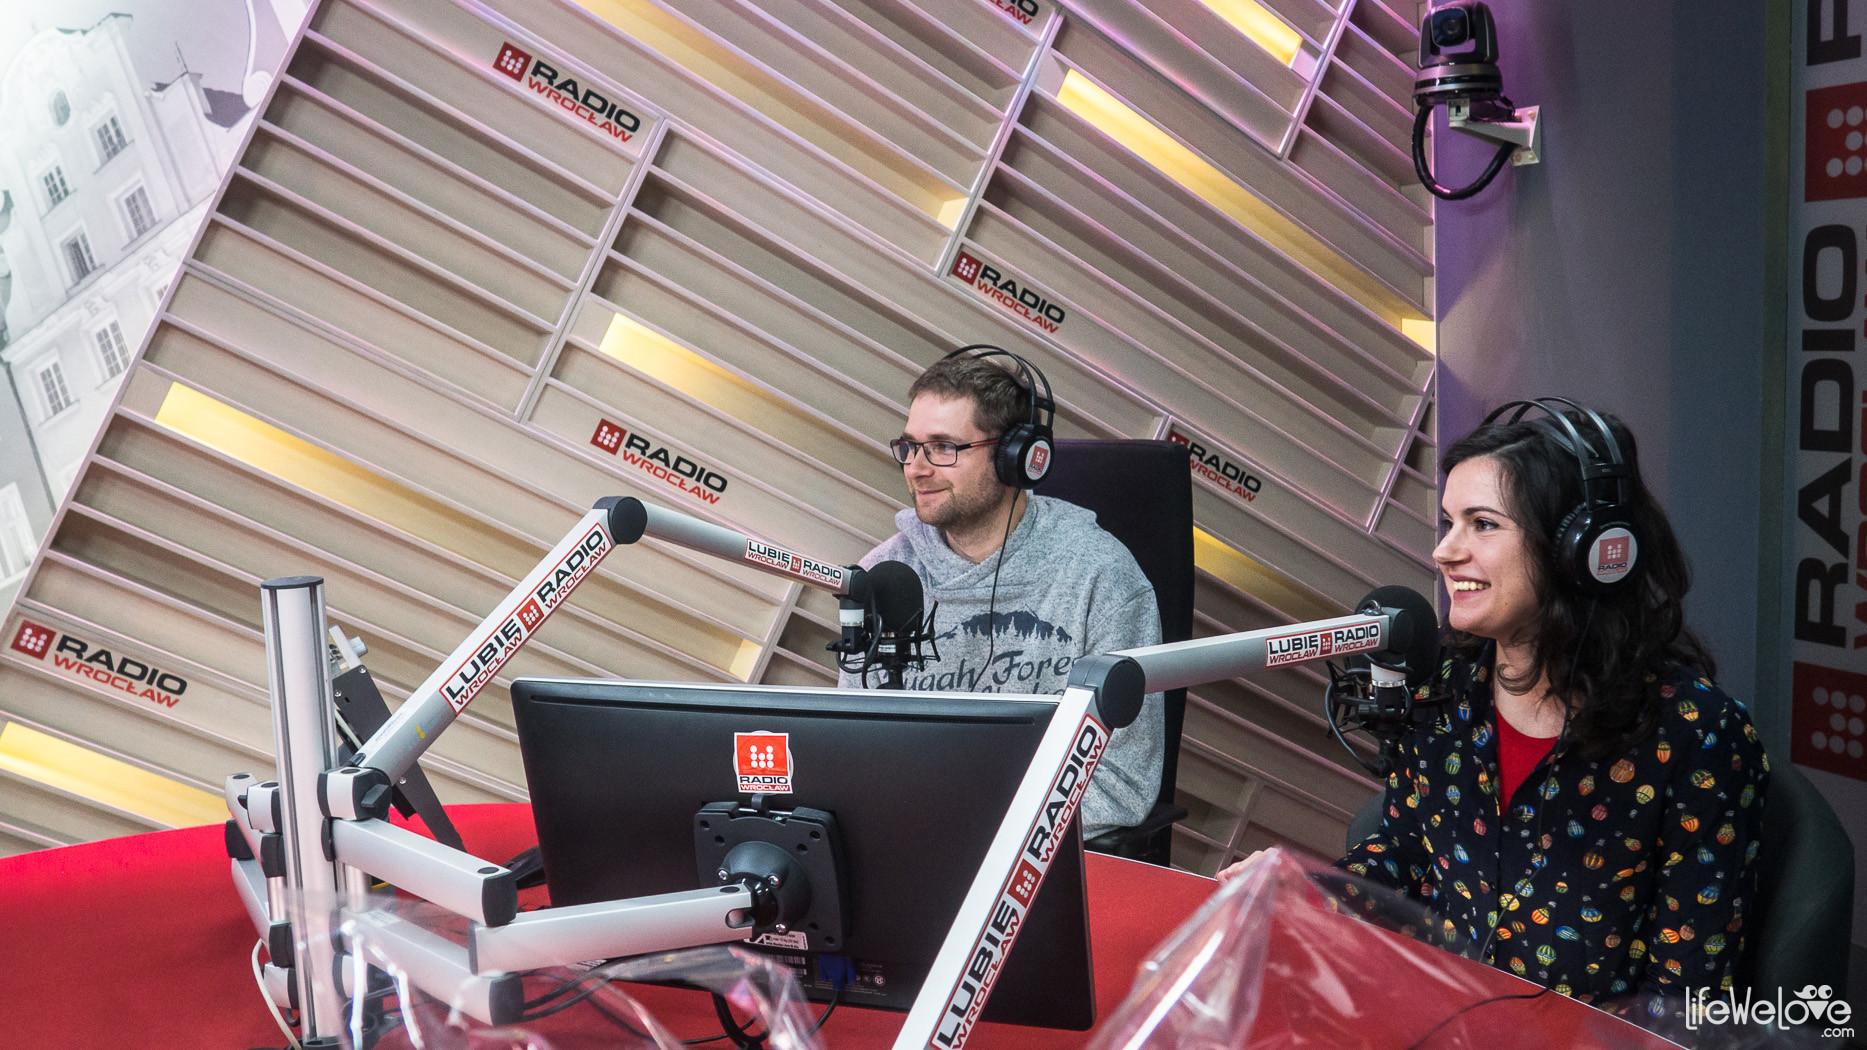 Digital Nomads - podcast in Radio Wroclaw